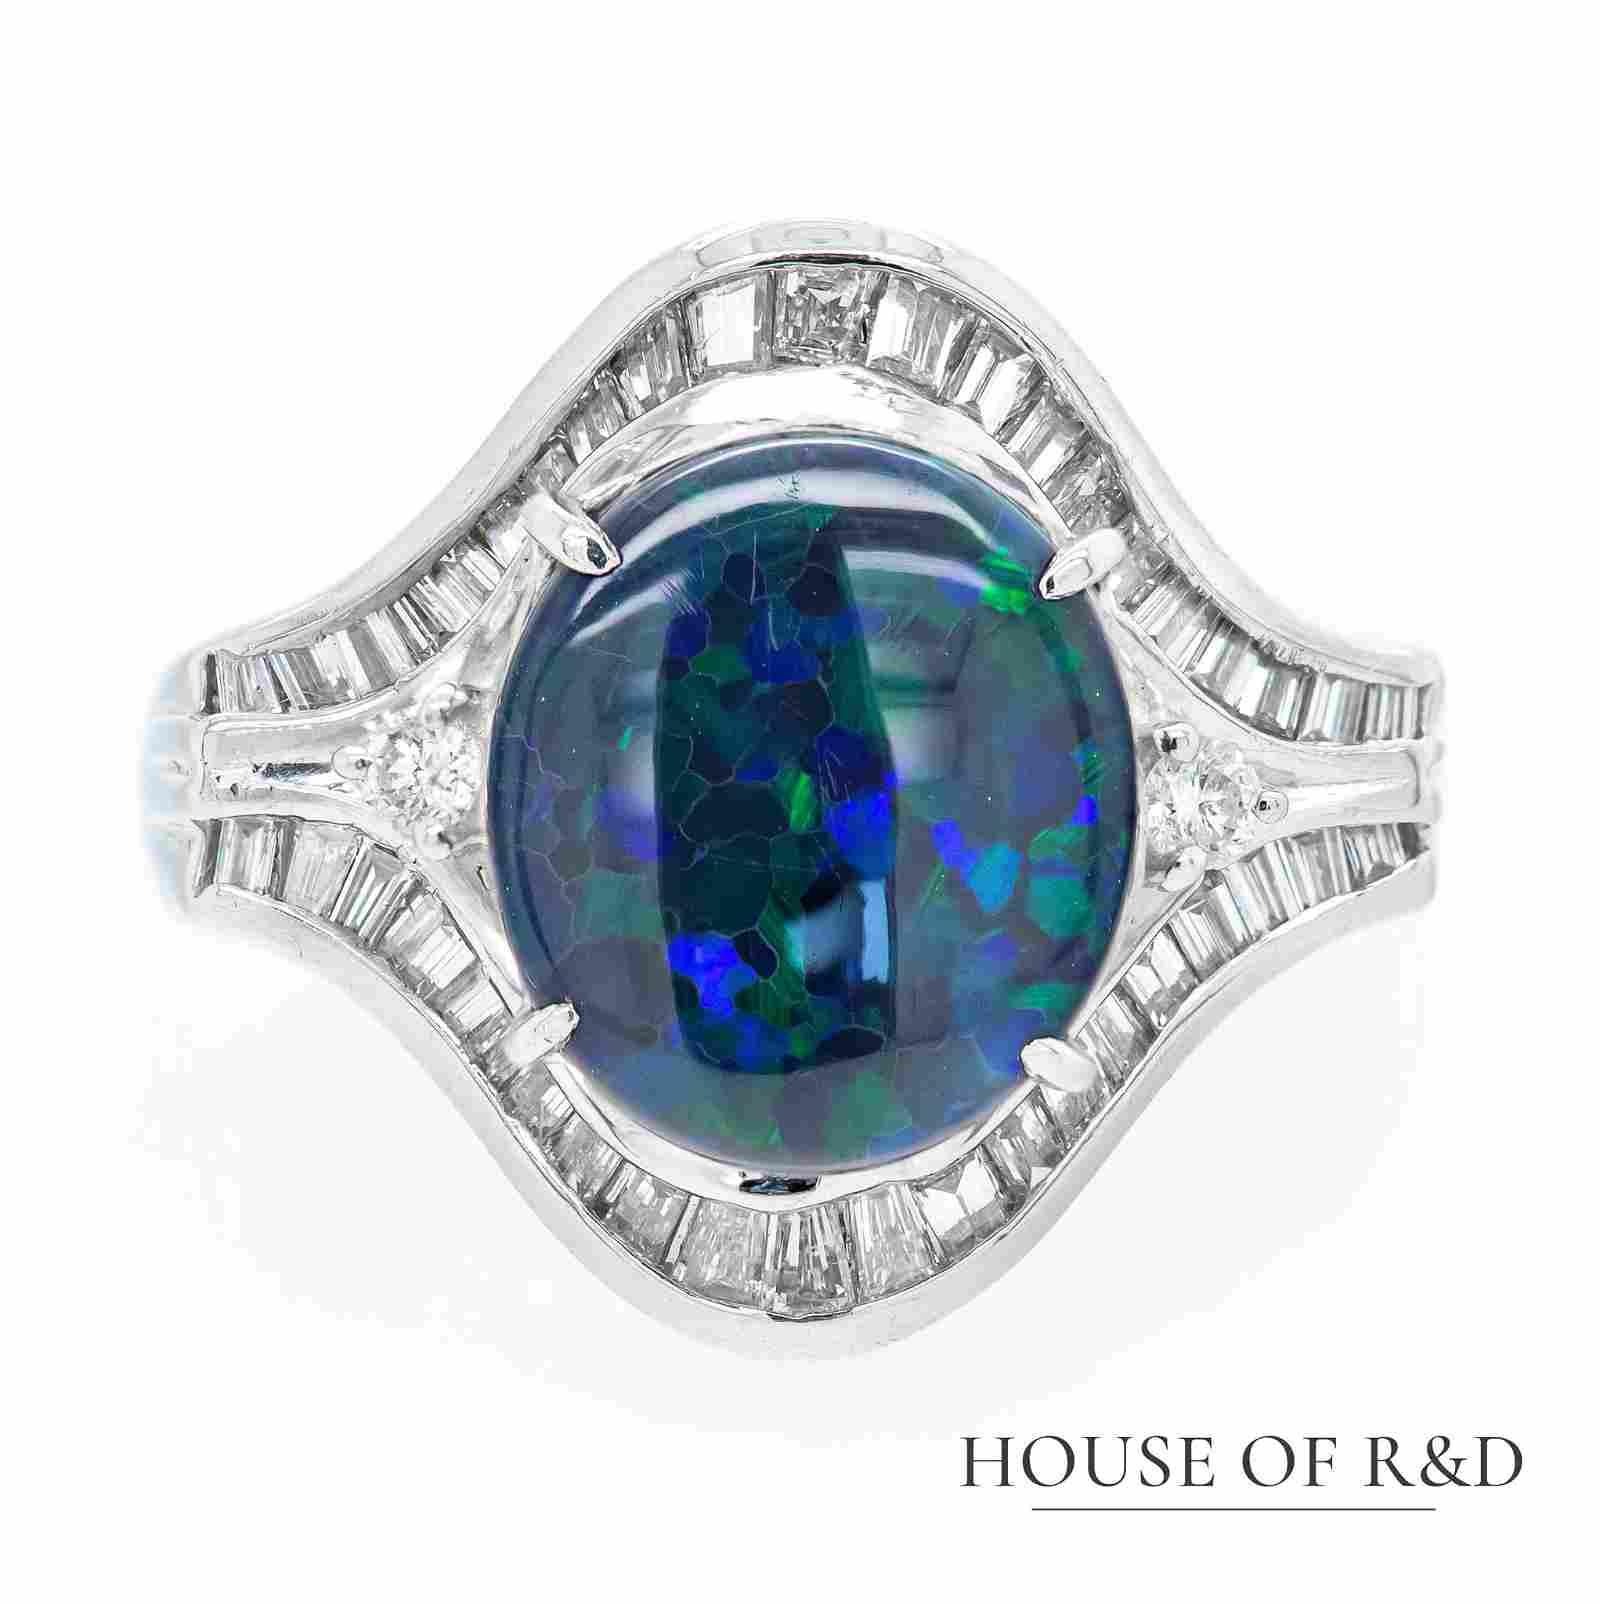 Platinum 900 - 3.27tcw -  Black Opal & Diamonds Ring